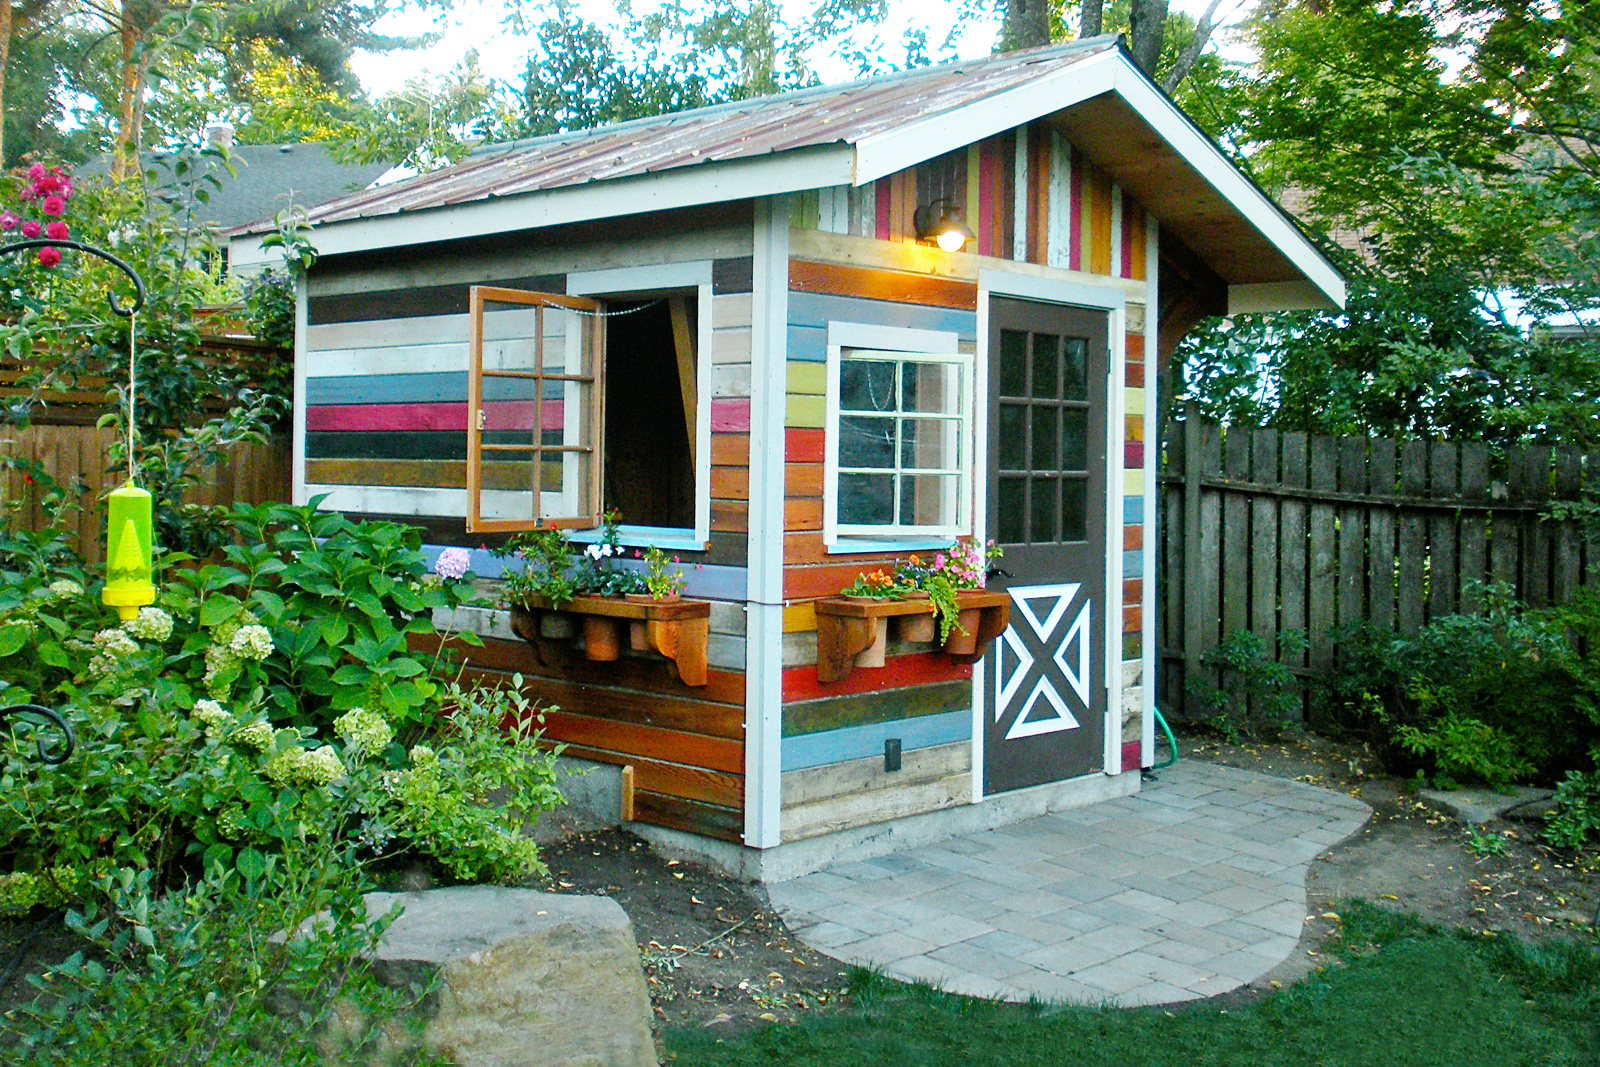 Colorful backyard shed